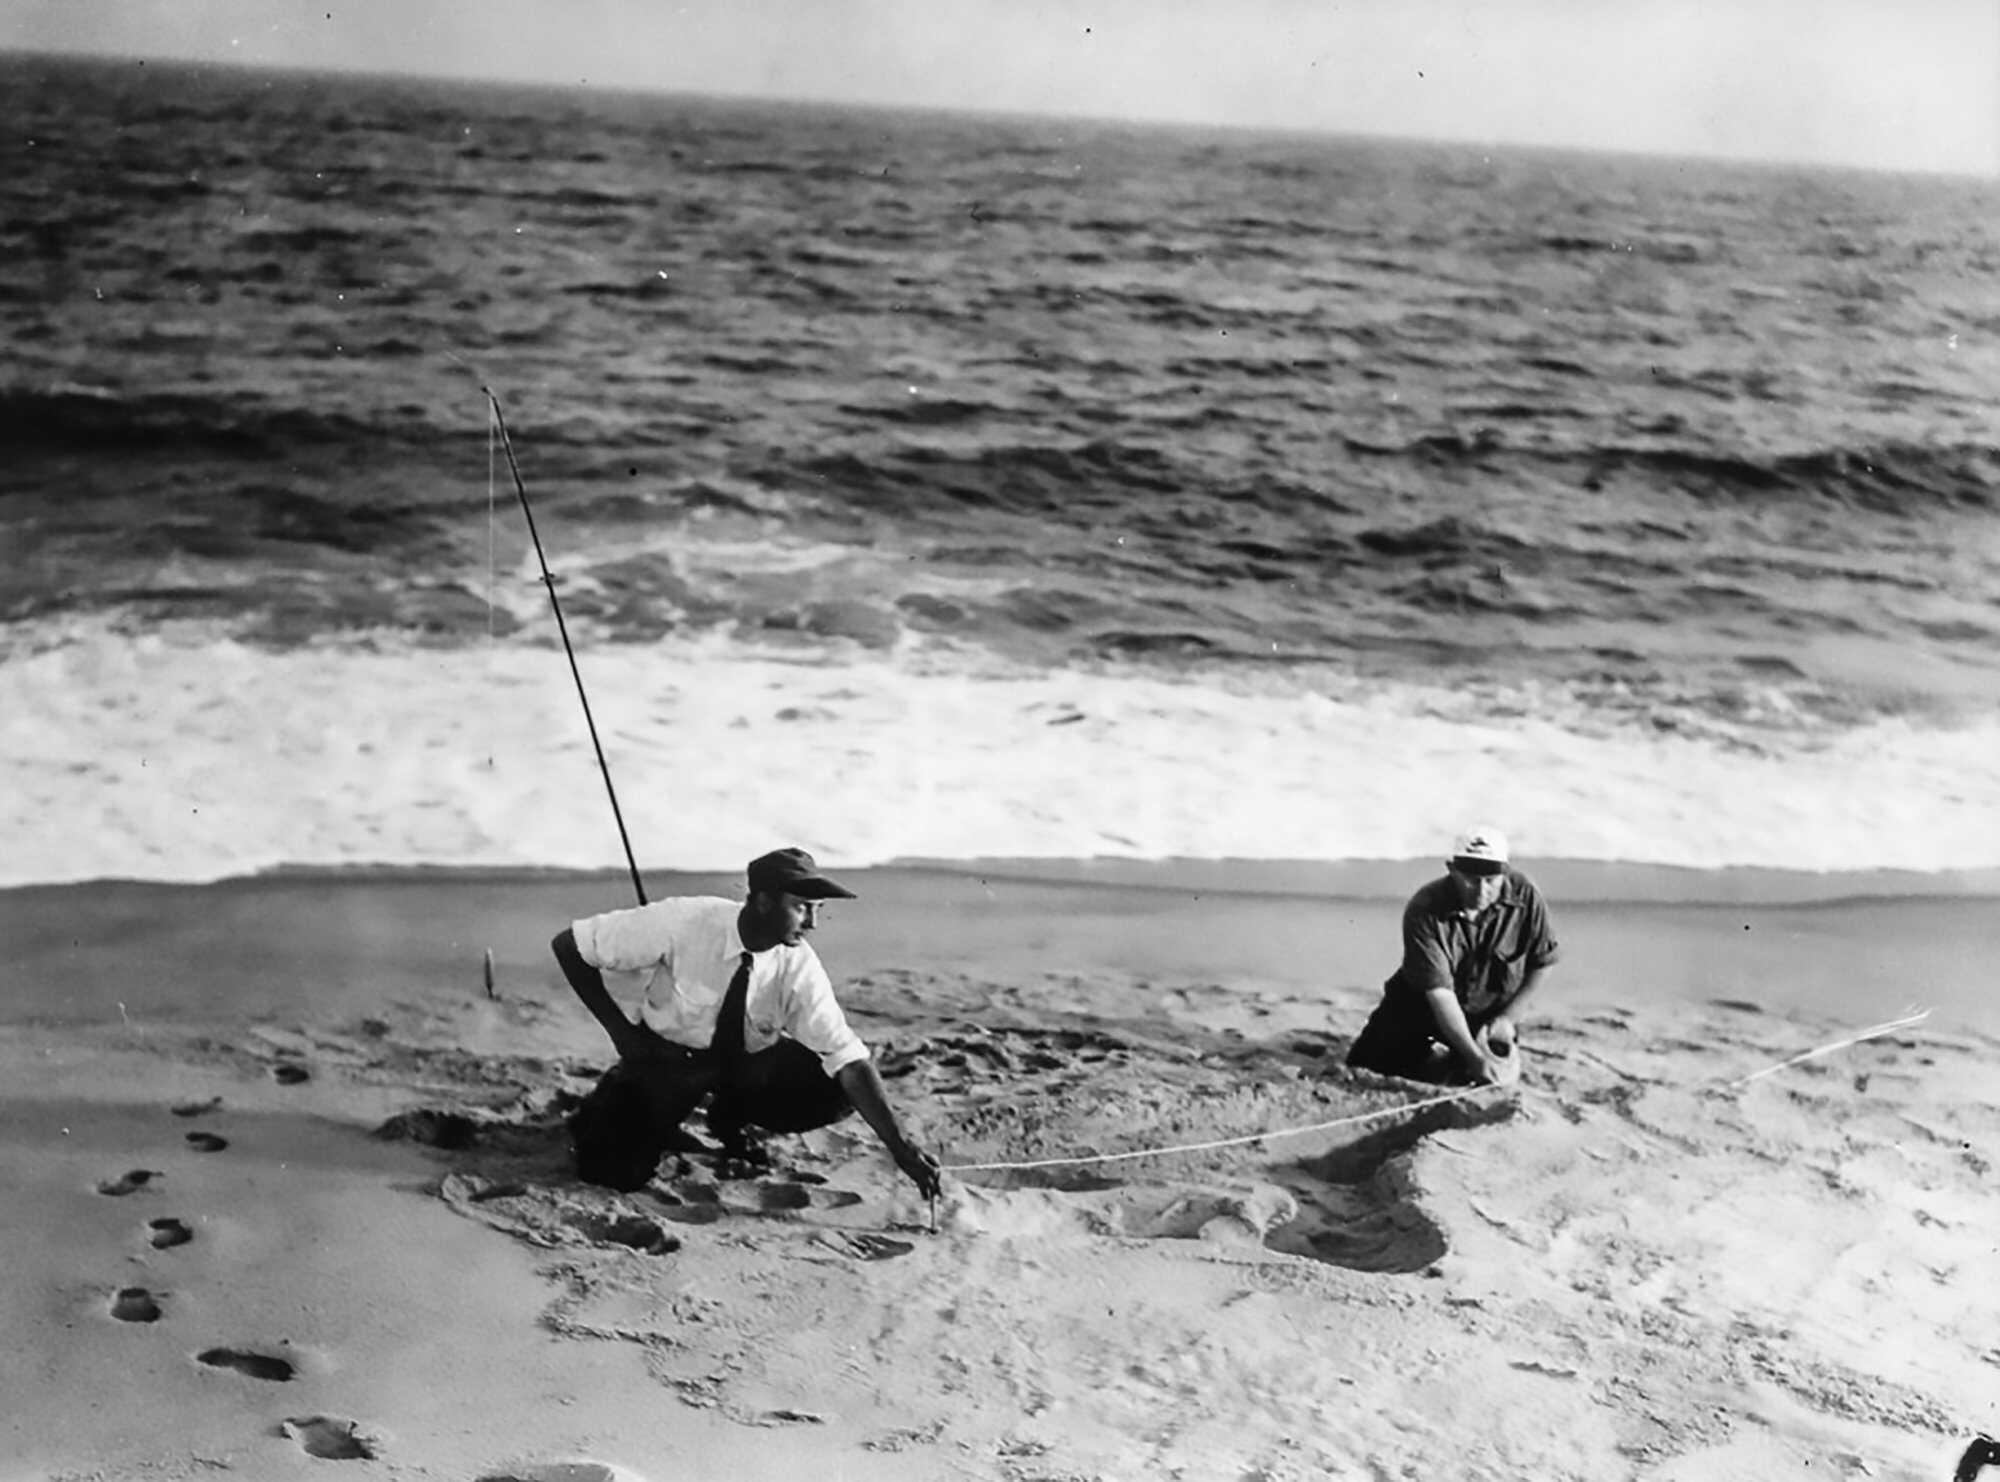 Sea-Monster-Beach-Measure-NHA_http-%2F%2Fa.amz.mshcdn.com%2Fwp-content%2Fuploads%2F2016%2F02%2Fseaserpent-11.jpg